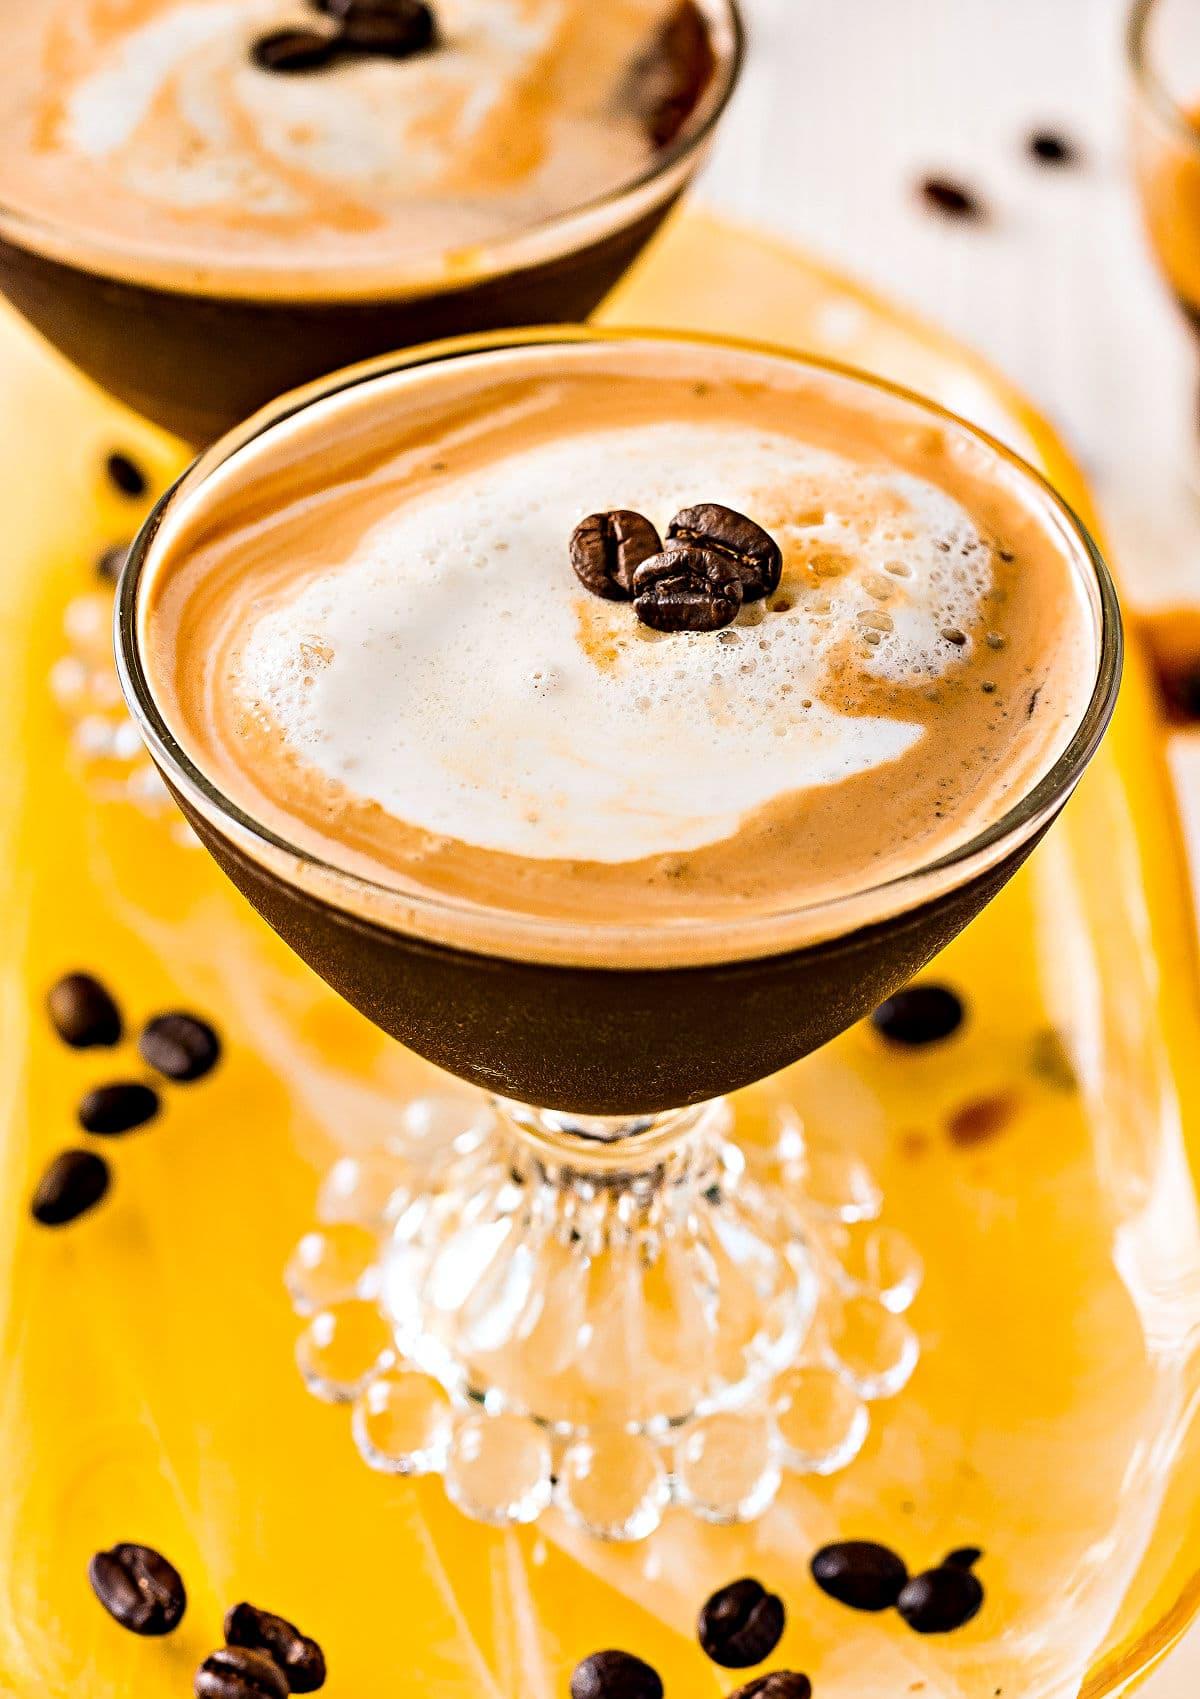 espresso martini recipe in two glasses on yellow glass tray top down view